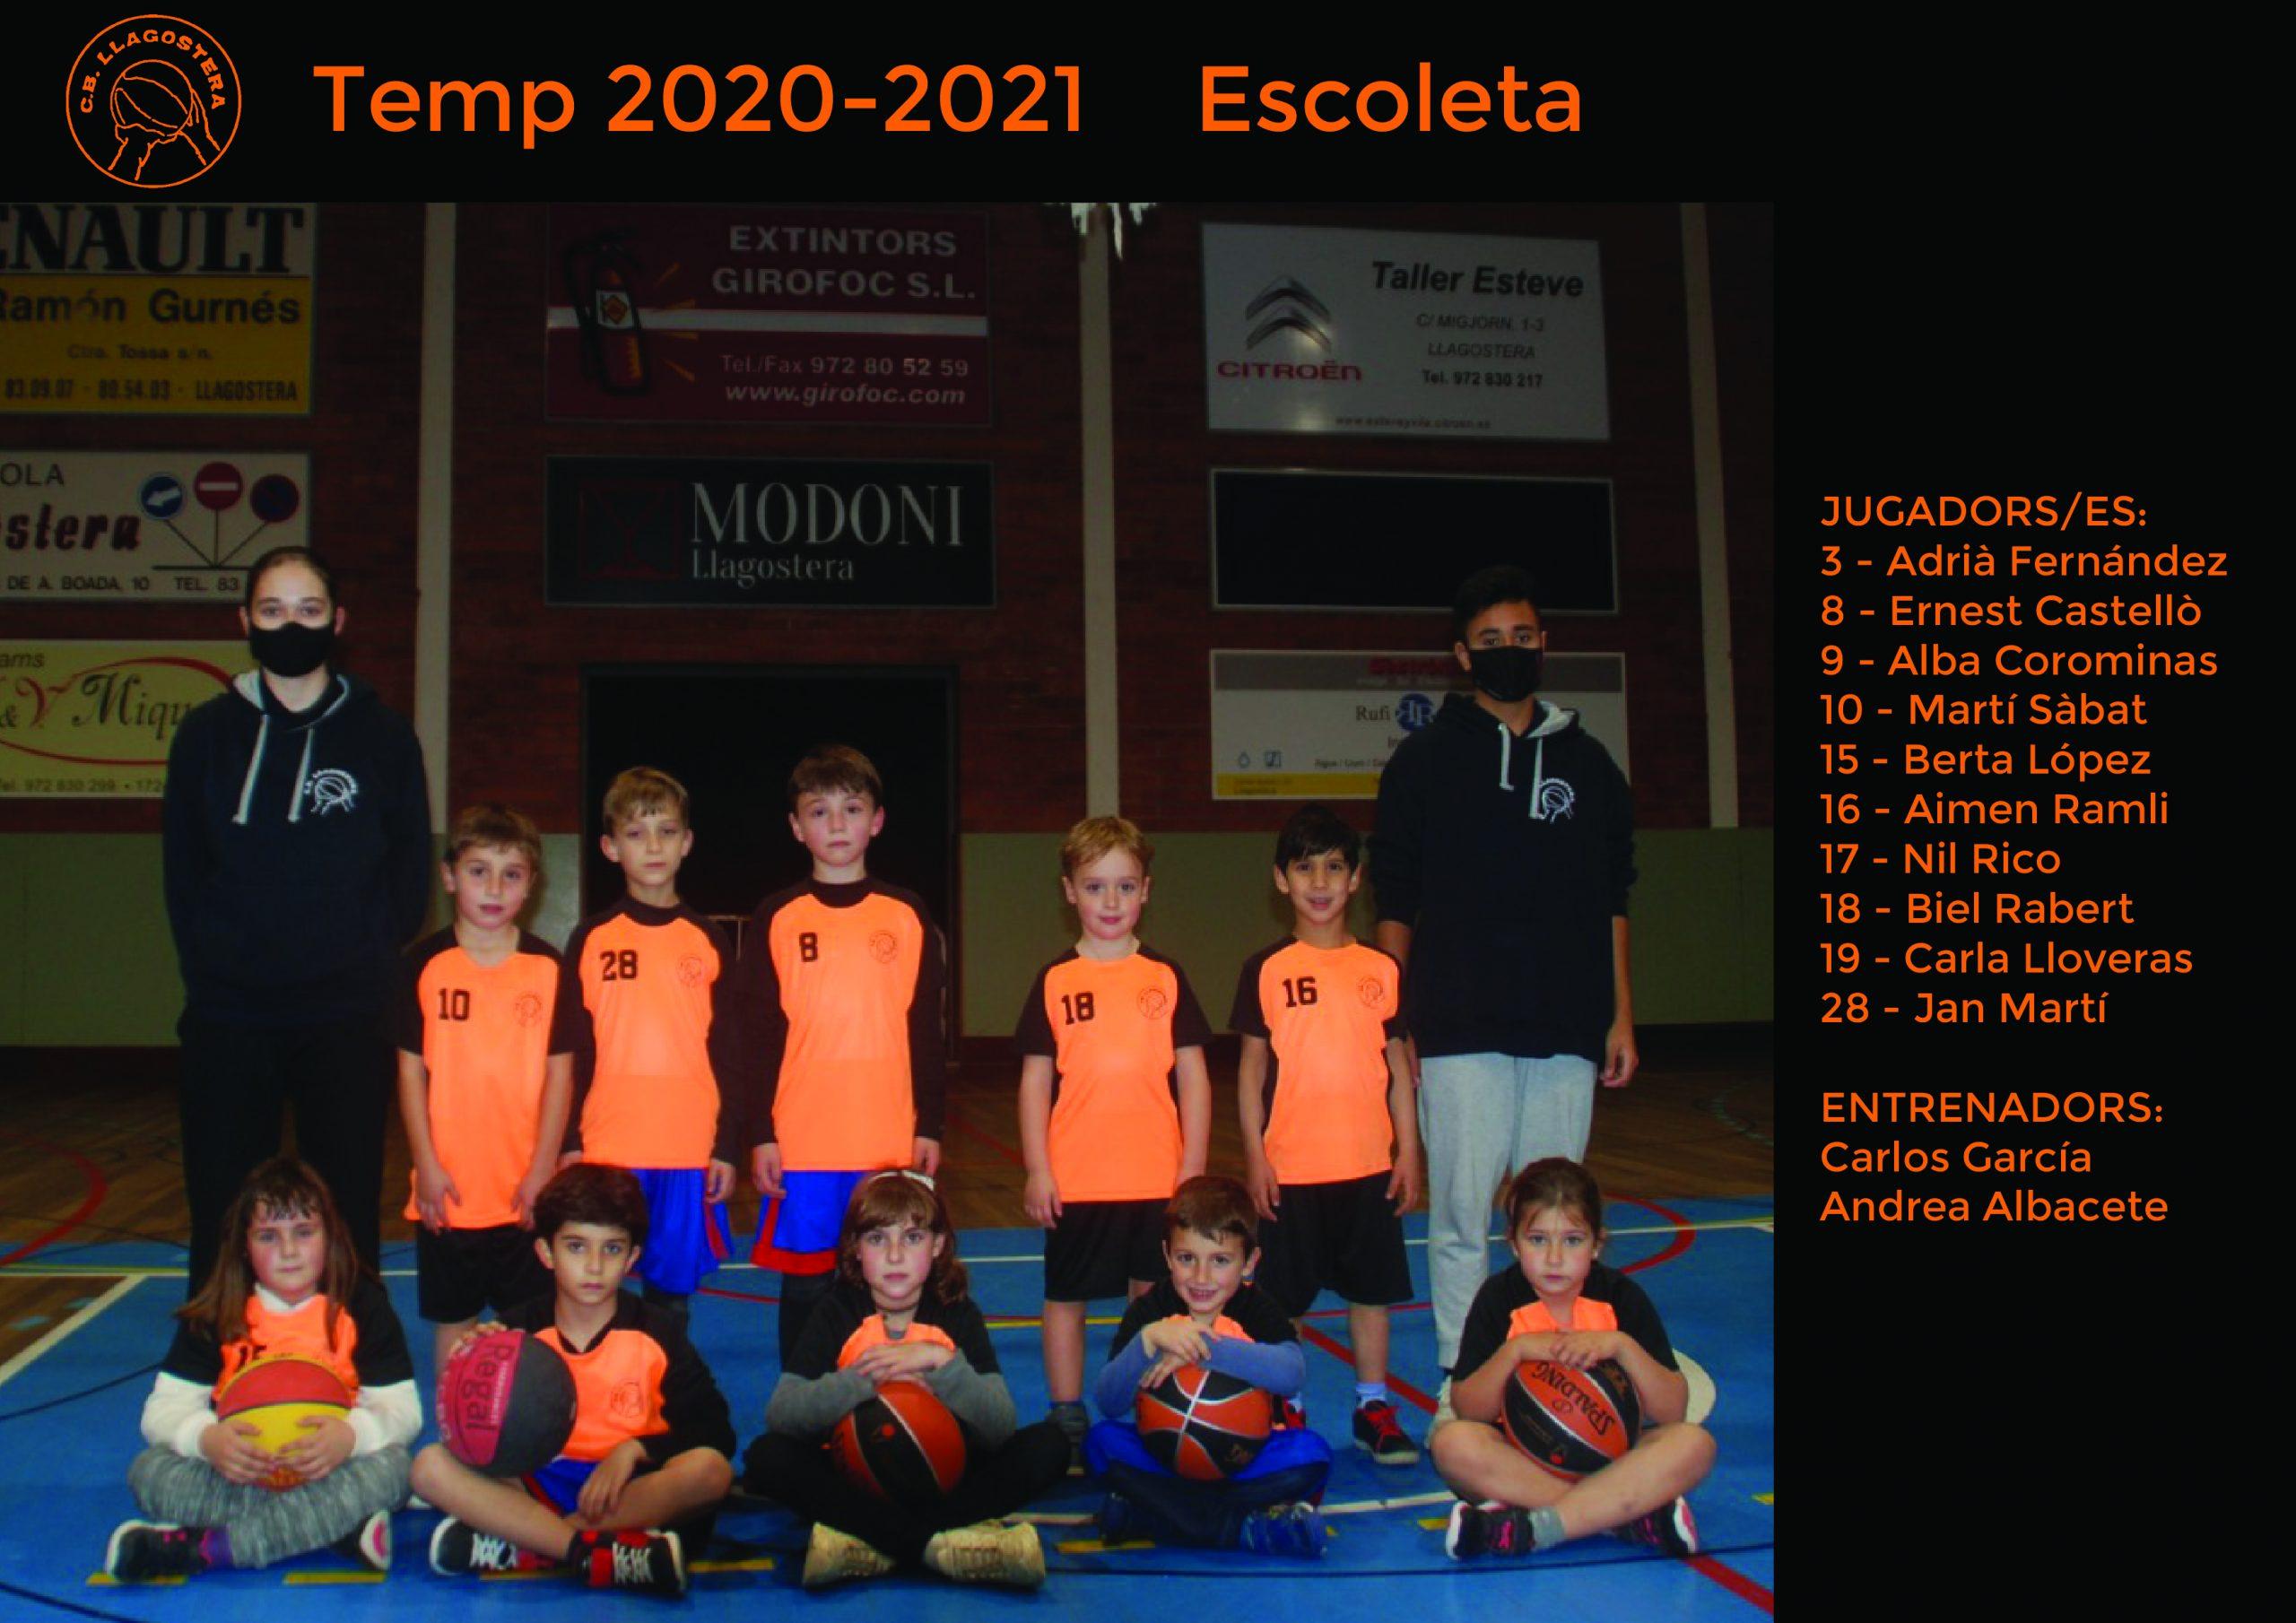 http://www.cbllagostera.com/wp-content/uploads/2021/04/ESCOLETA_A4-01-scaled.jpg